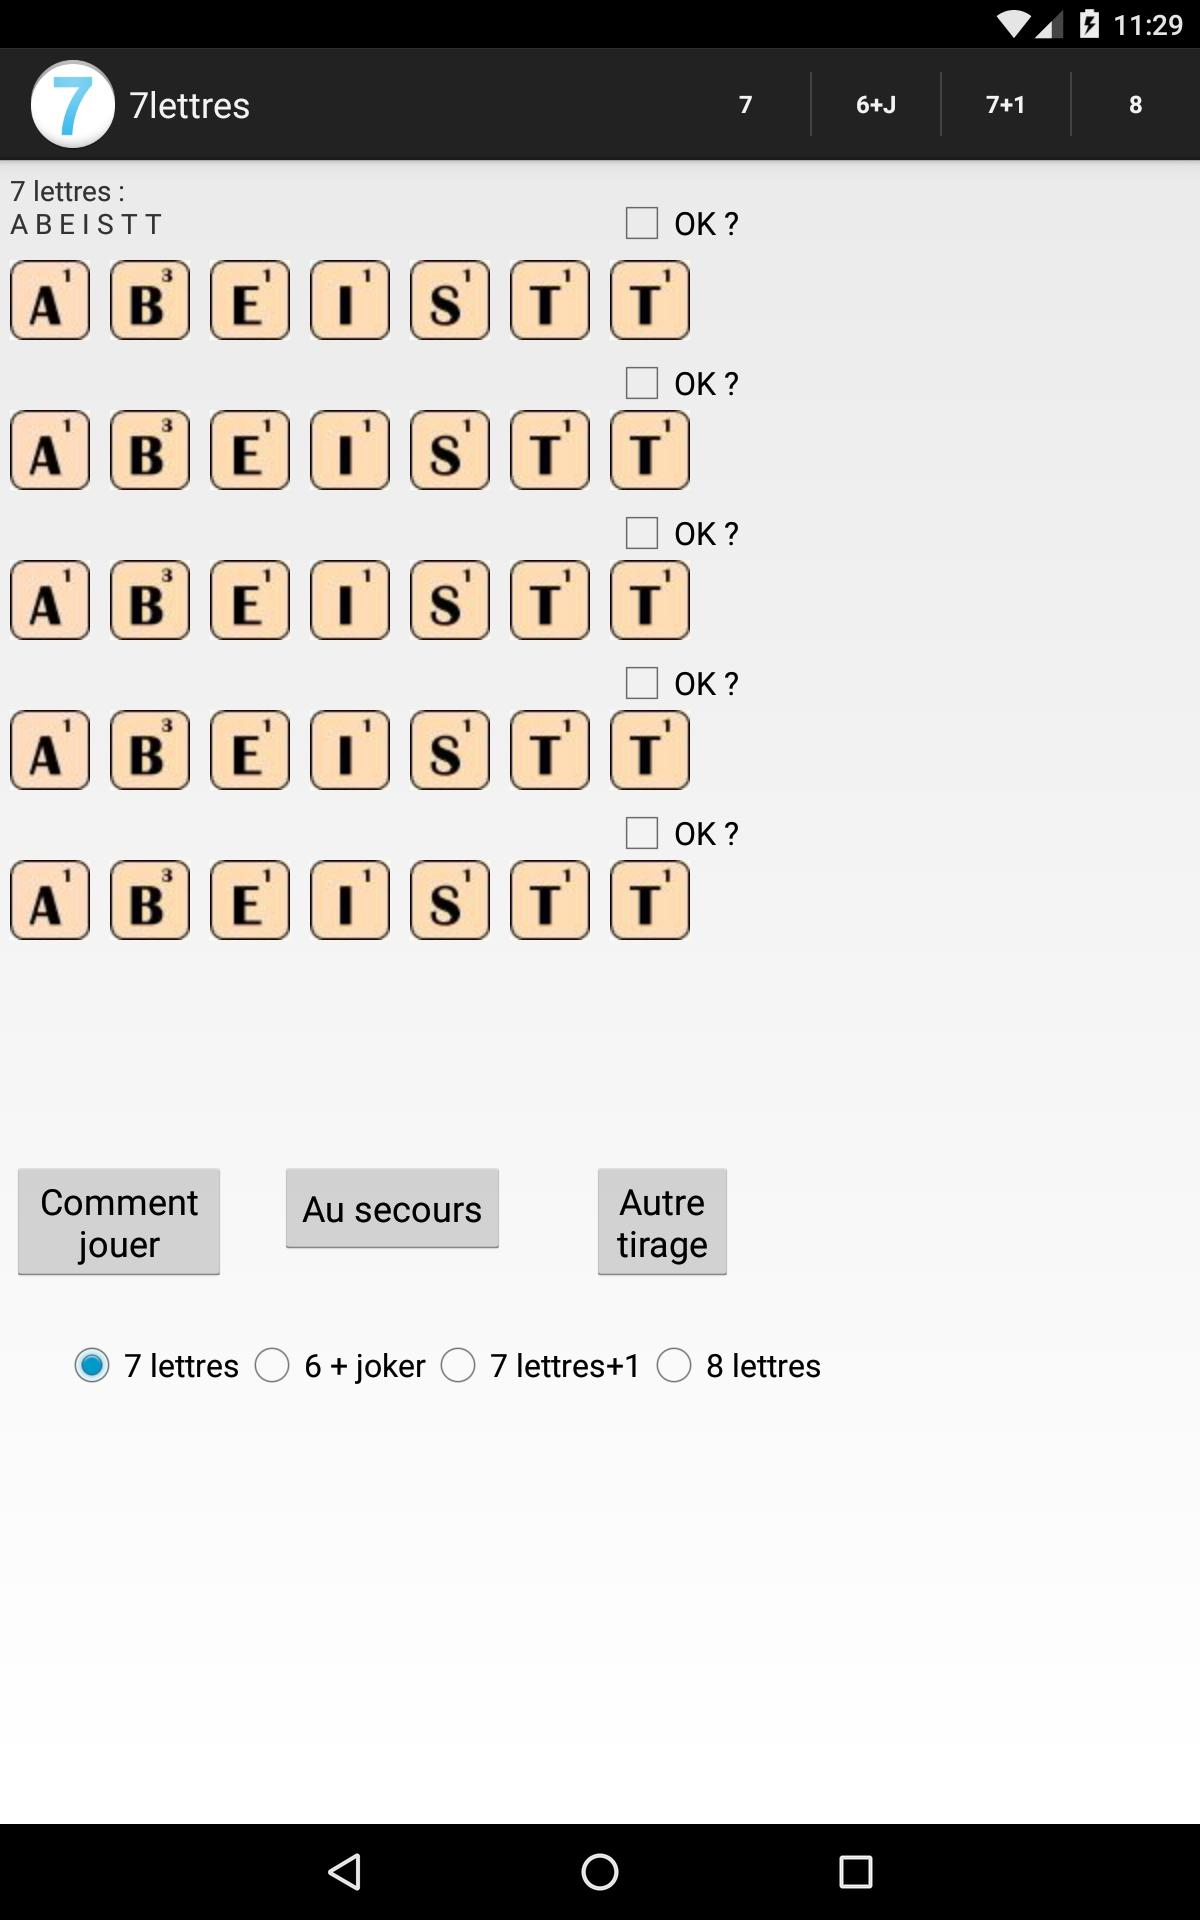 Anagrammes 7 Lettres For Android - Apk Download dedans Jeux Anagramme Gratuit A Telecharger